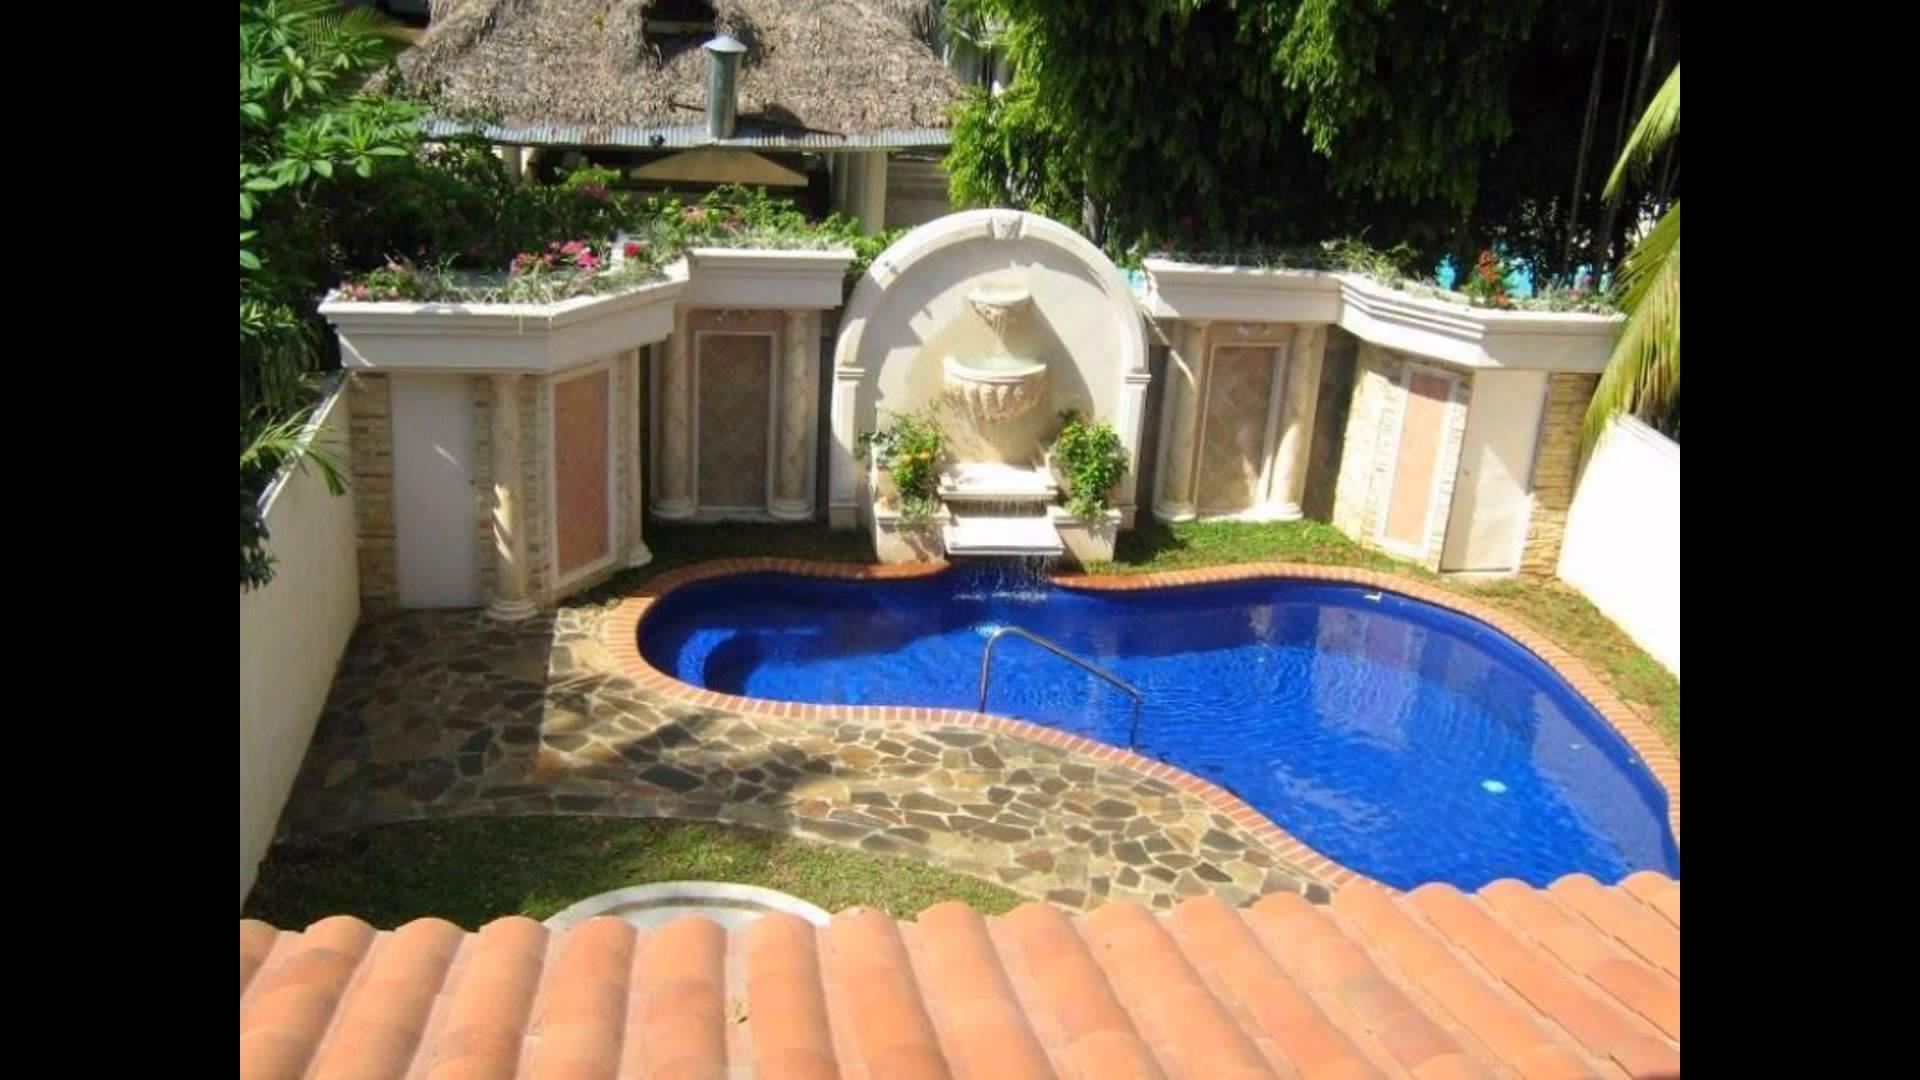 small backyard pools inground swimming pool designs for small backyards underground pools ideas ZYXBAMD